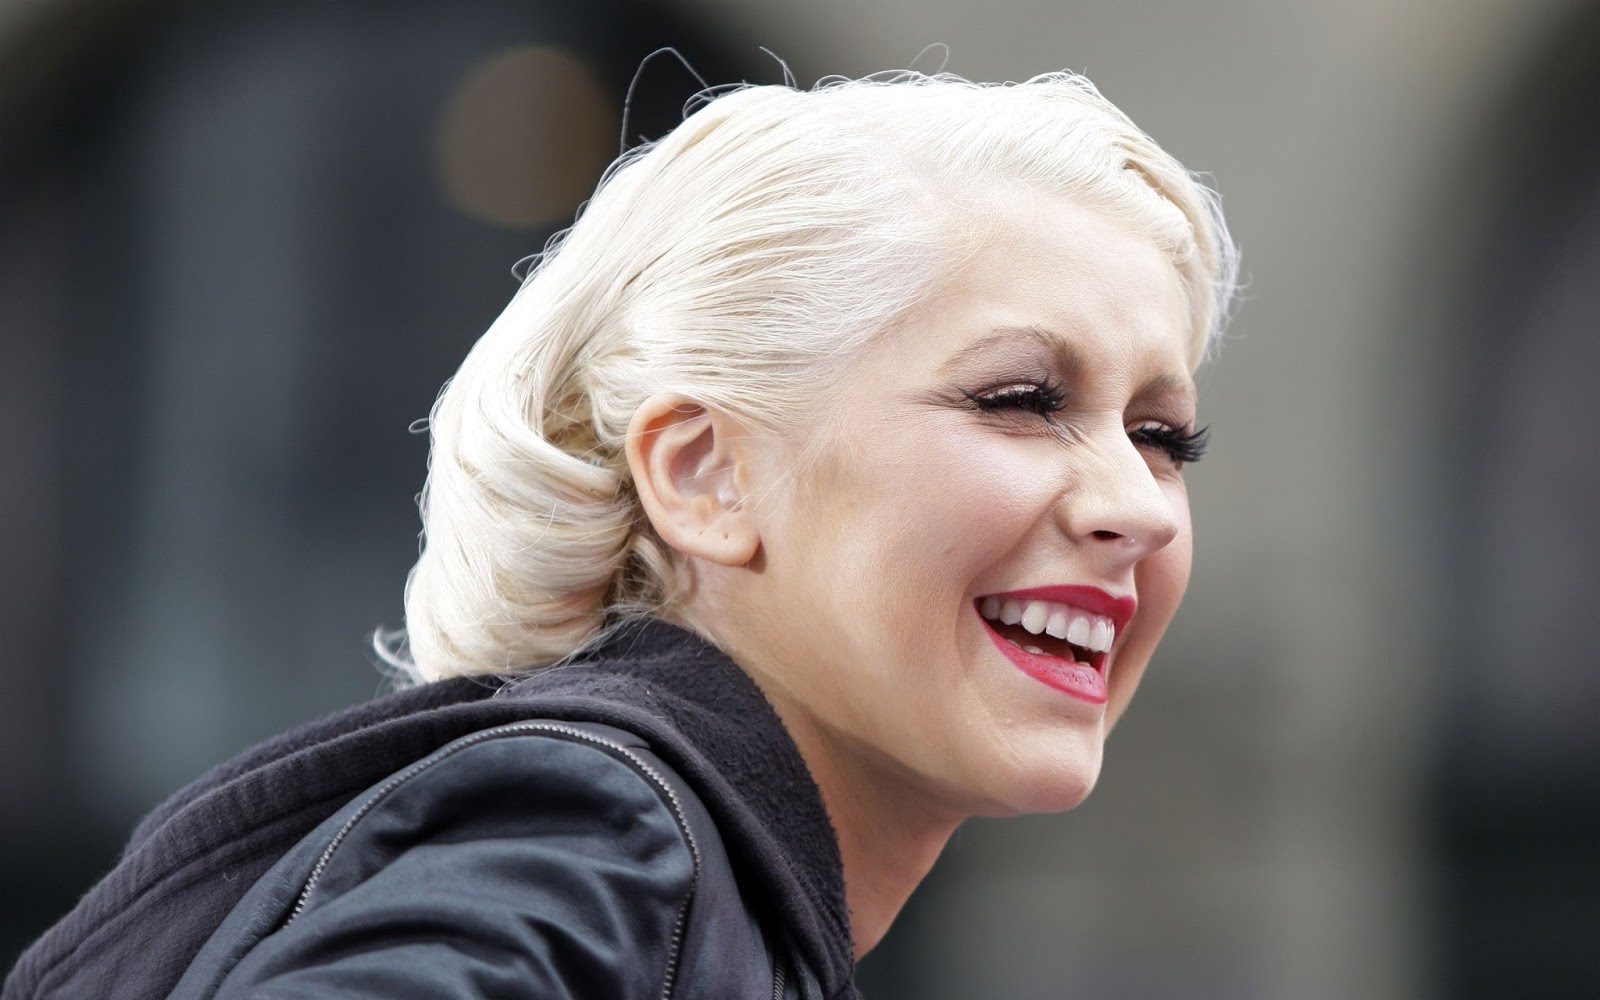 Christina Aguilera Celebrity Wallpaper Pictures 59839 1600x1000px 1600x1000